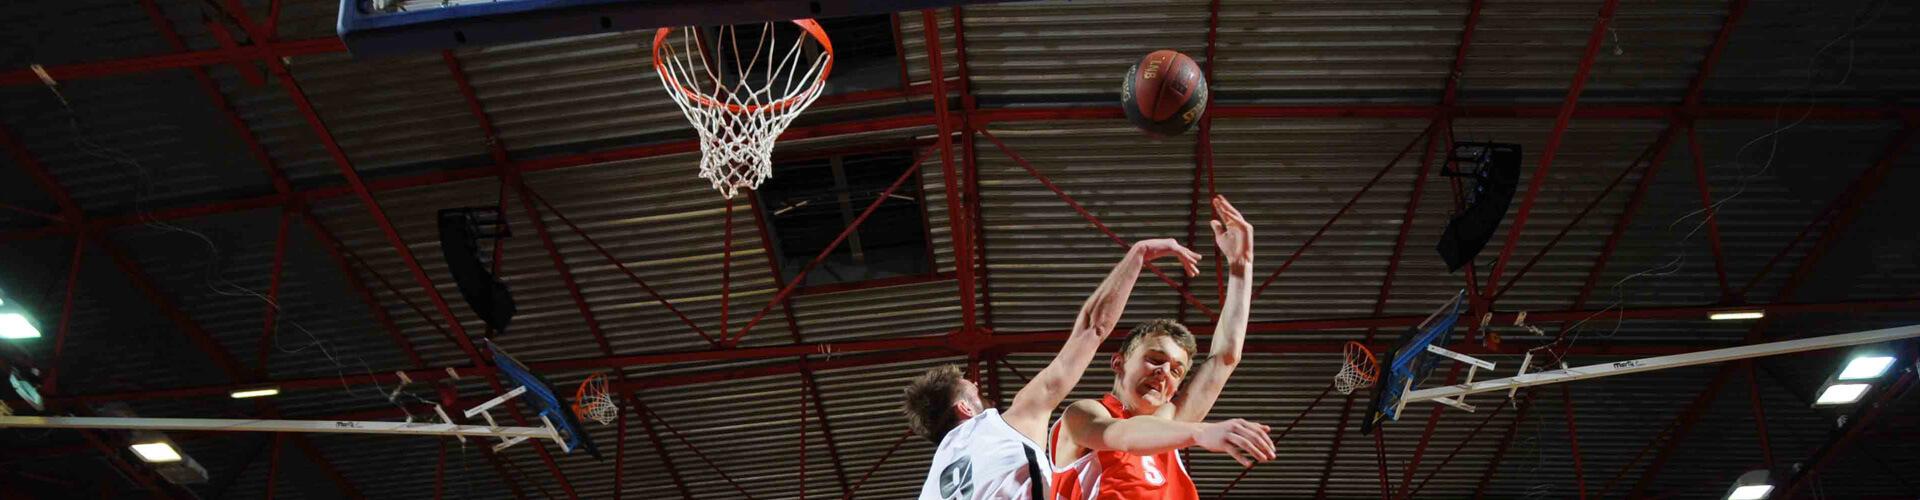 cholet-mondial-basketball-jeune-france-cholet